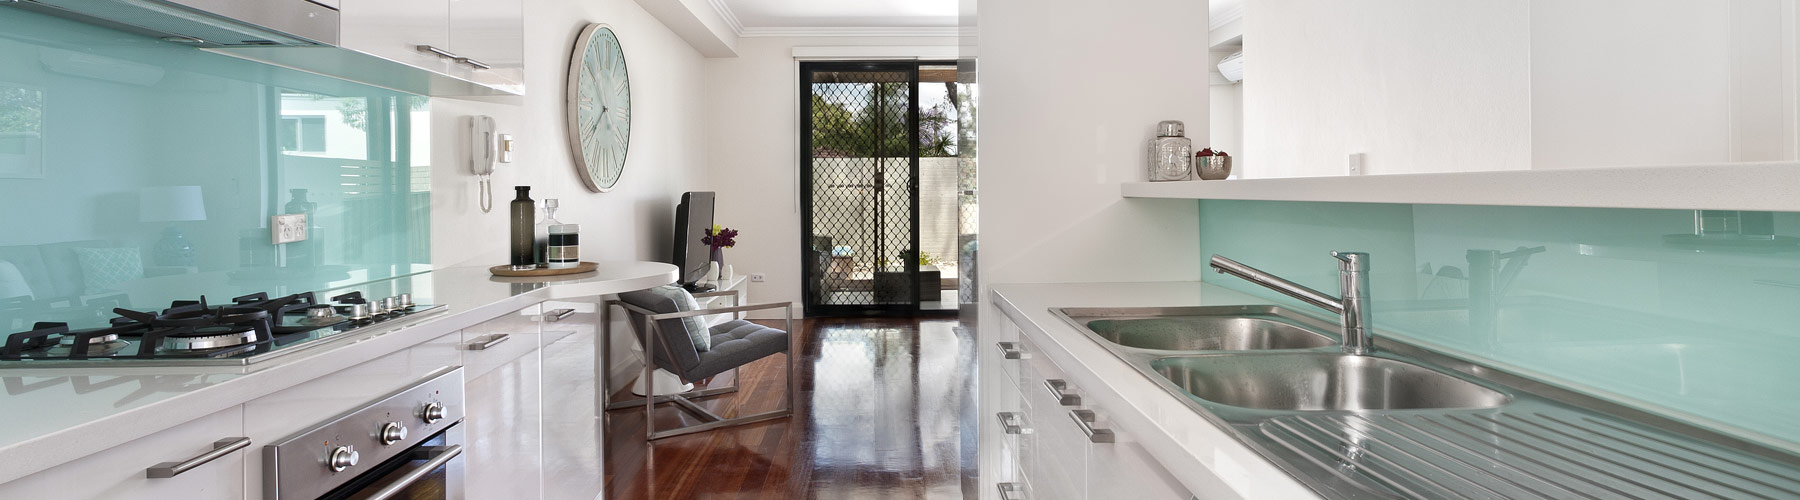 slider-inside-kitchen